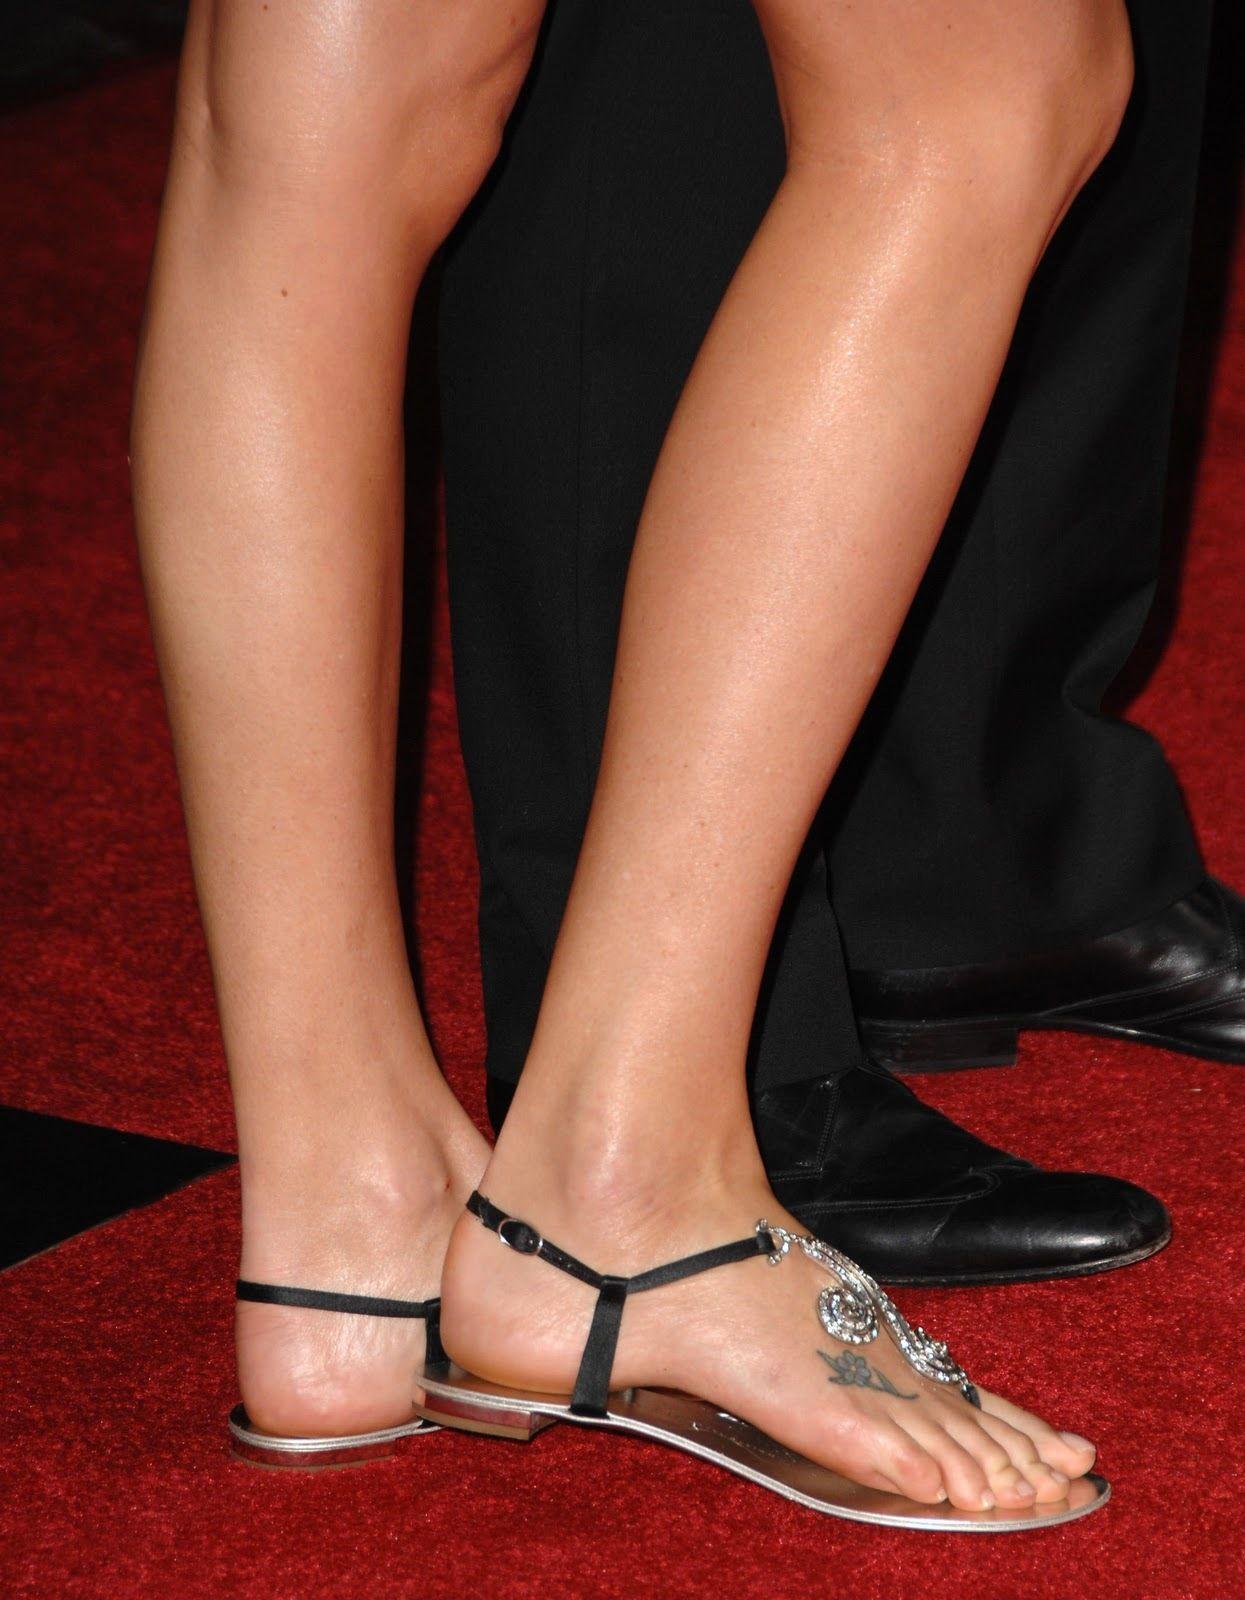 Charlize theron feet 1026363g 12451600 maria pinterest charlize theron feet 1026363g 12451600 voltagebd Choice Image